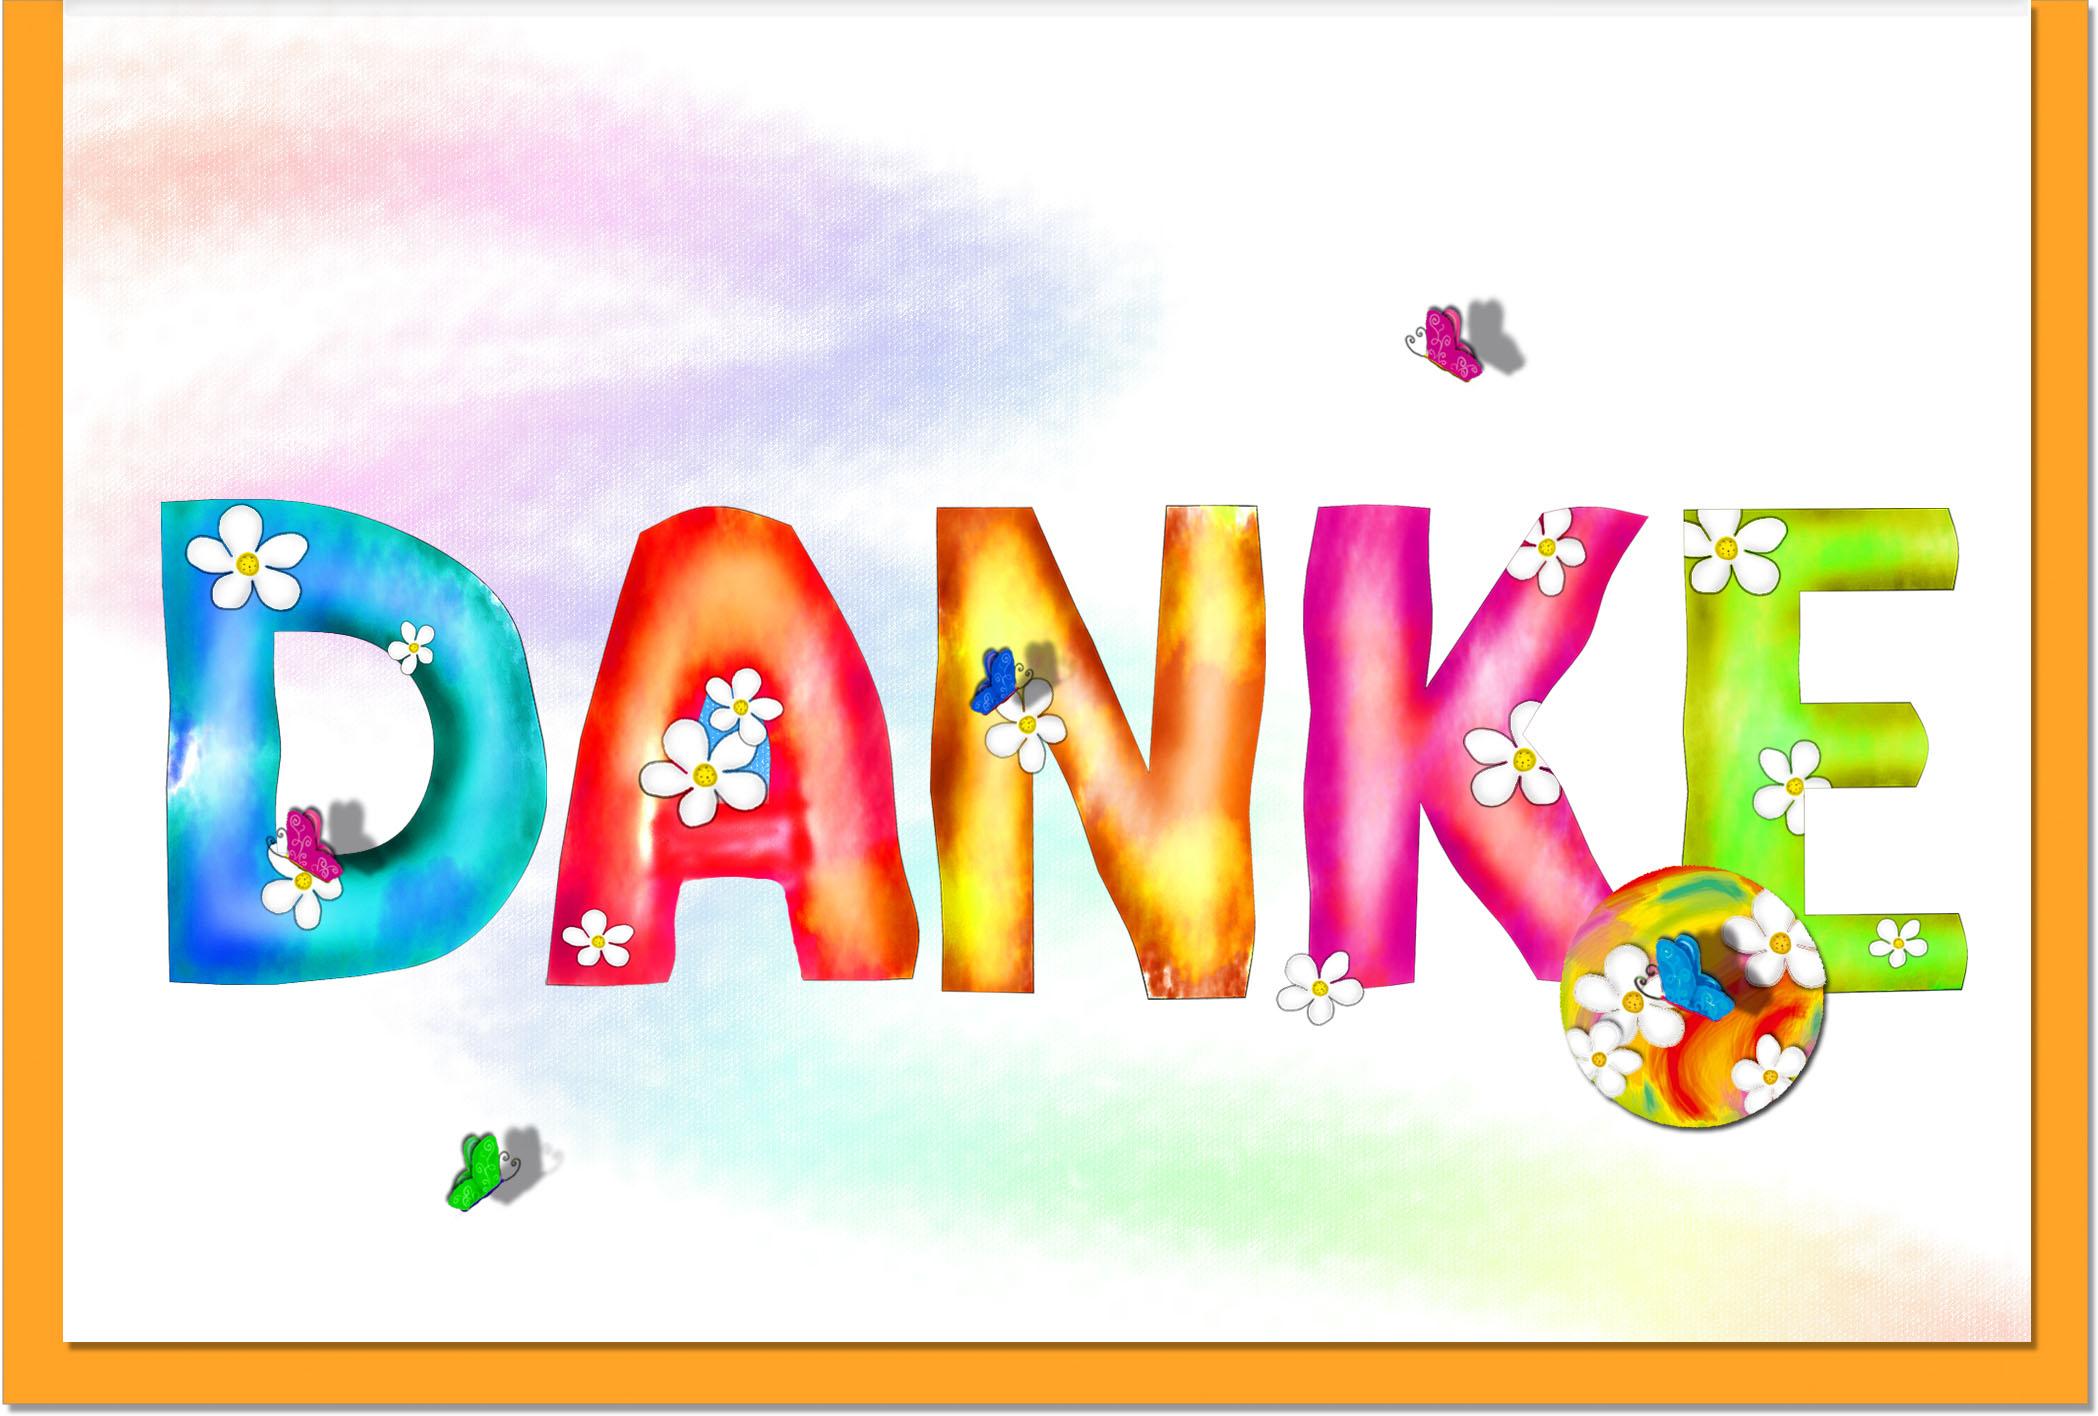 Dankeskarten / Grußkarten /Dankeschön Bunter Schriftzug